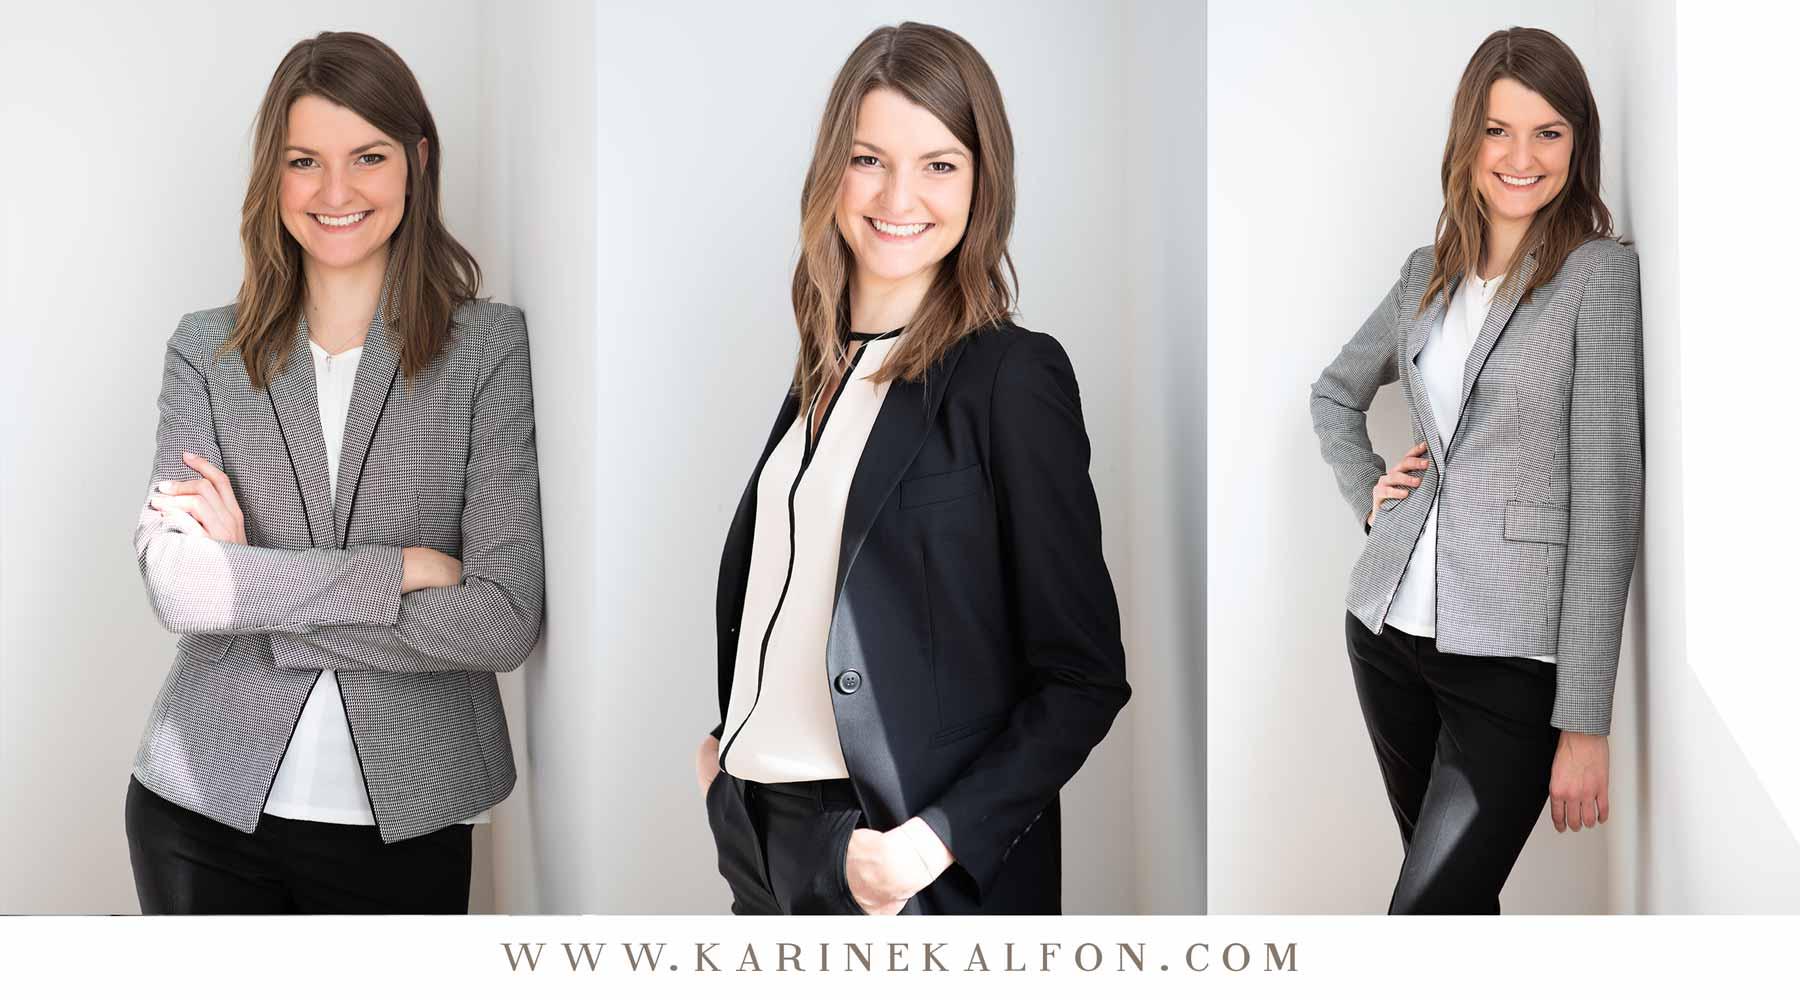 Karine_Kalfon_Portrait_bf20209